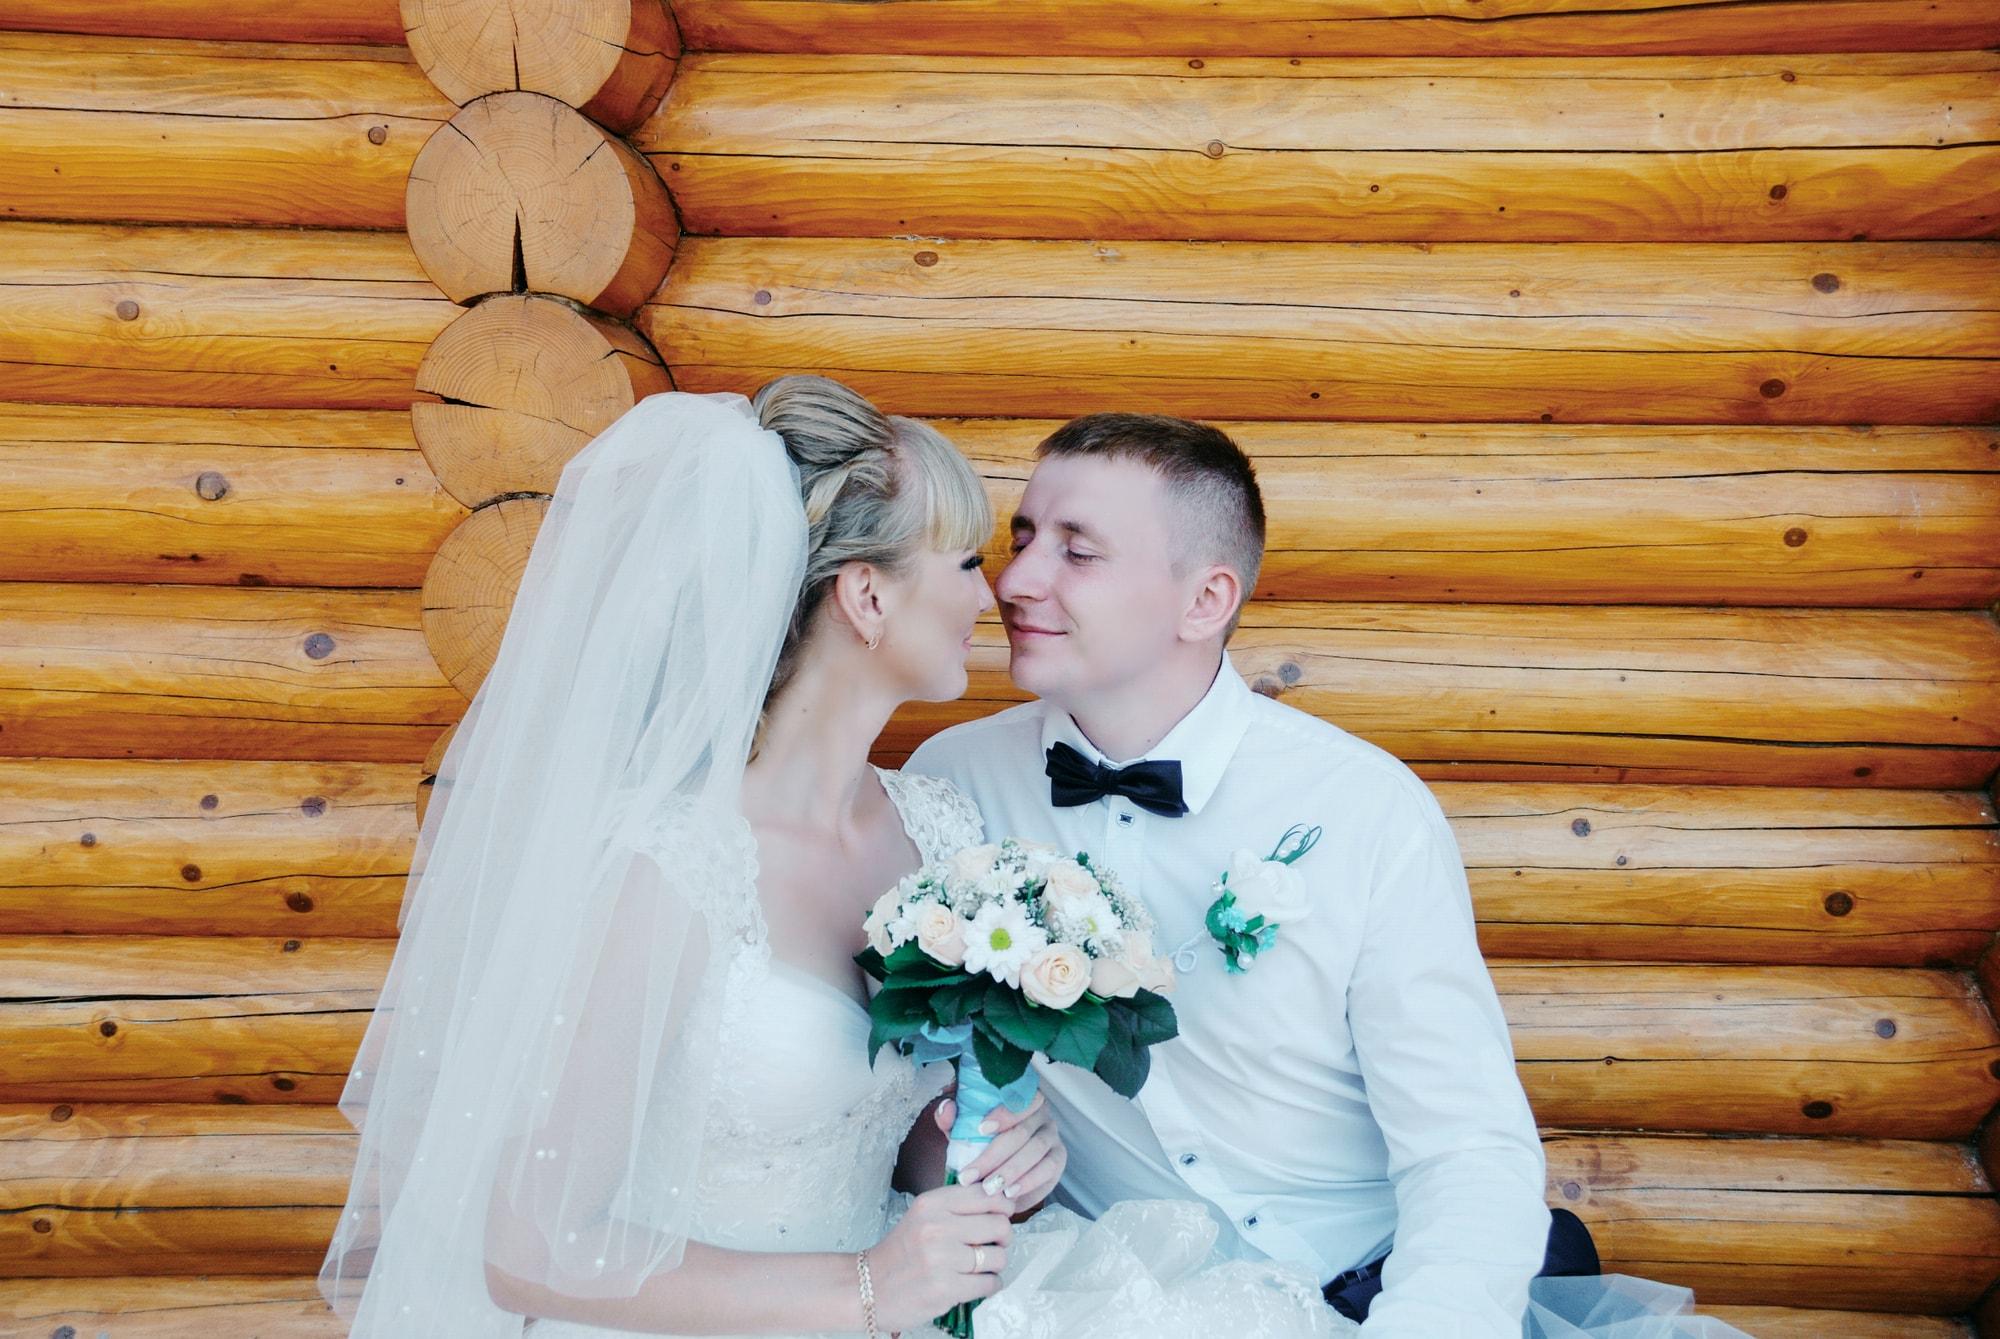 Невеста возле домика - Фотограф Киев - Женя Лайт